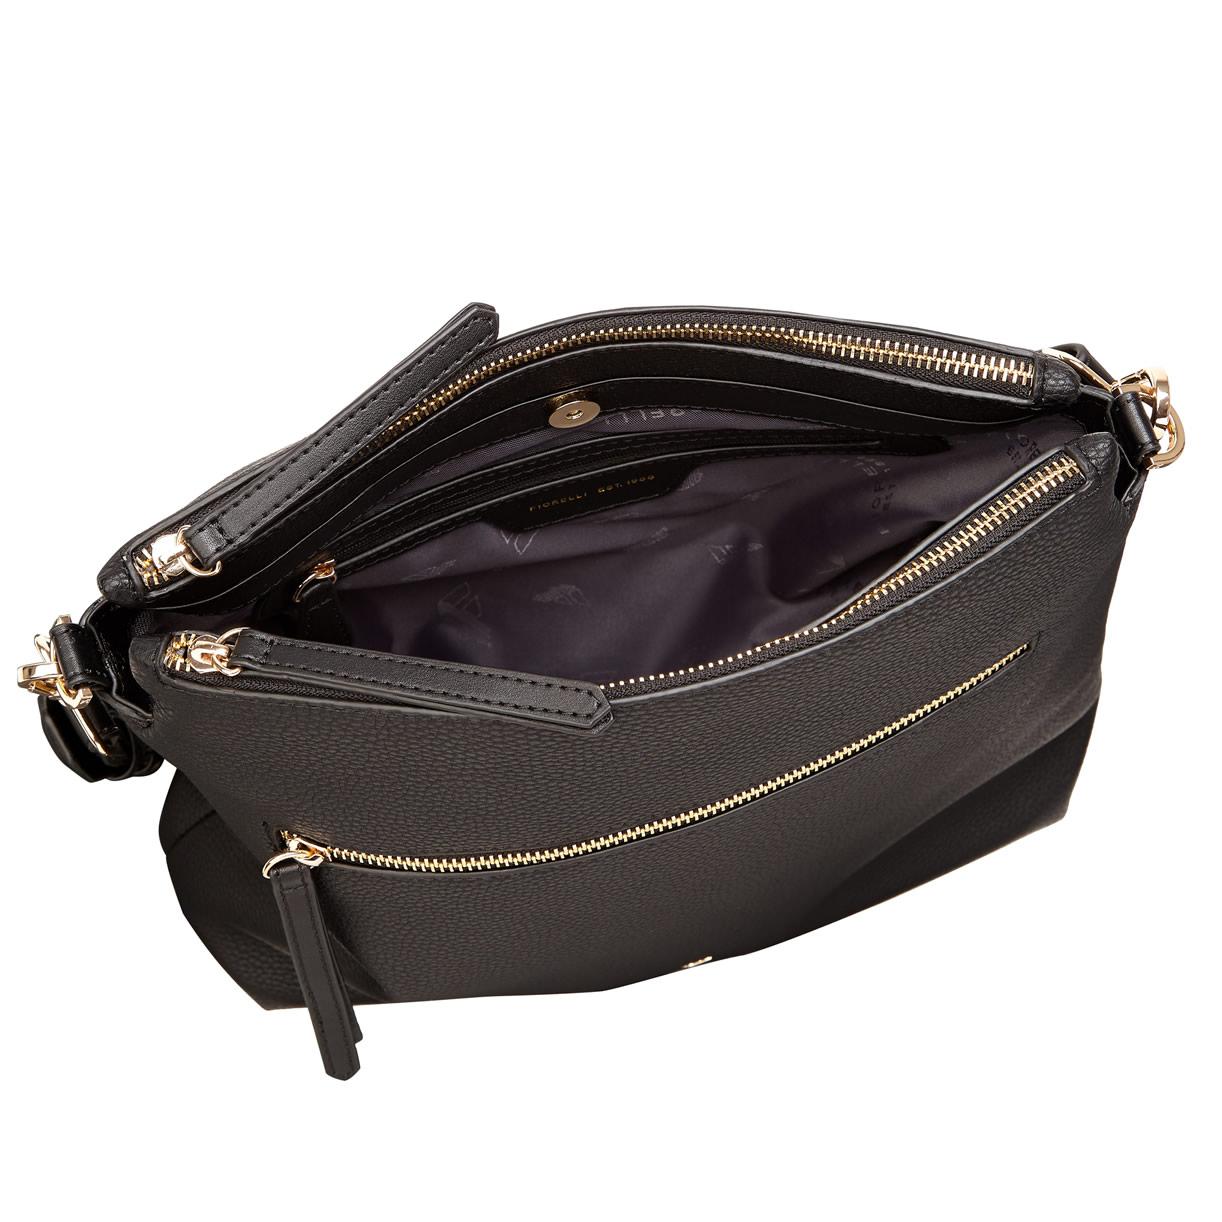 399e38646e4 Fiorelli Elliot Crossbody Dual Strap Bag - Black - BLACK - Jehovah's ...